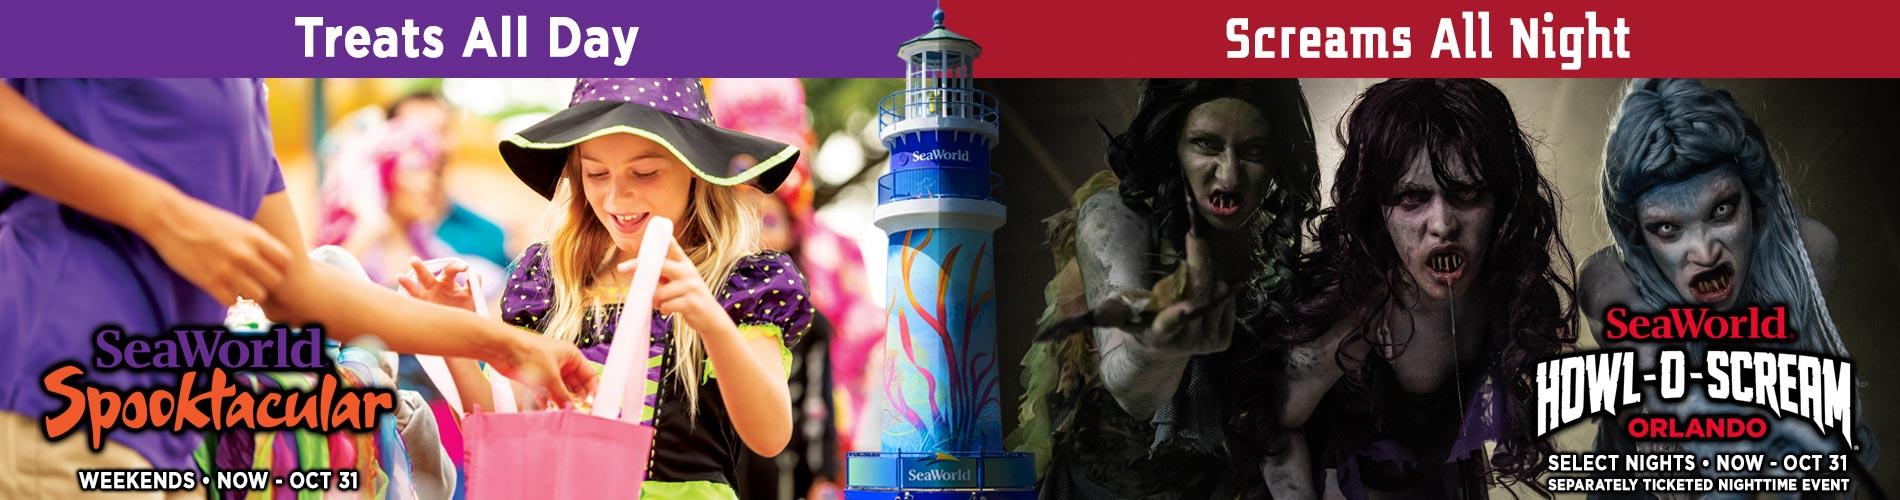 Halloween Spooktacular and Howl-O-Scream at SeaWorld Orlando